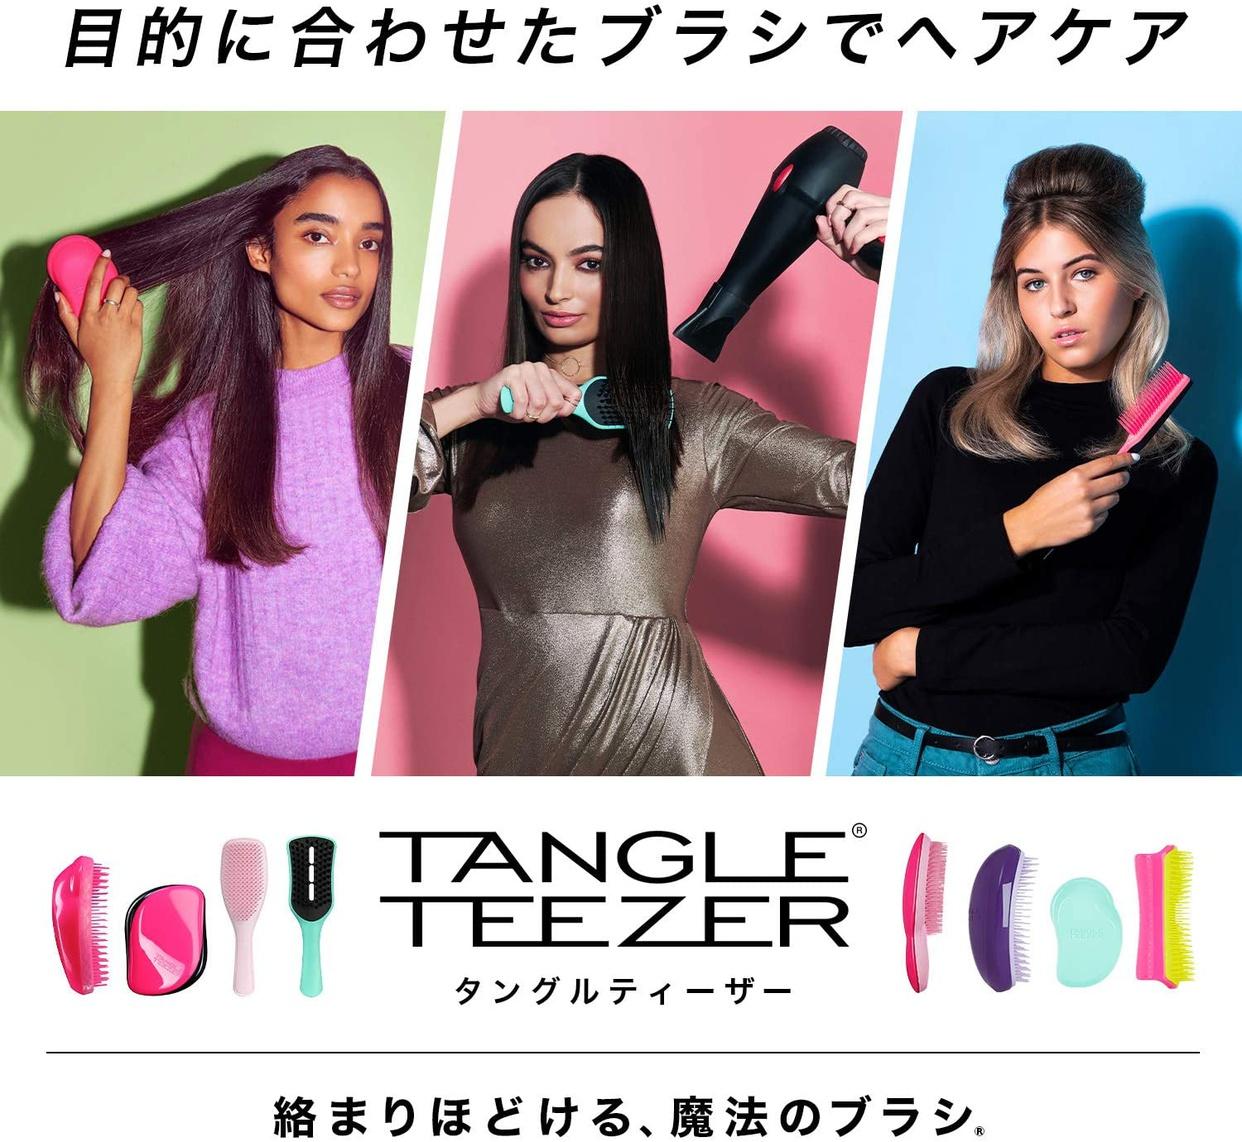 TANGLETEEZER(タングルティーザー) ザ・ウェットディタングラー ソフト&ダメージの商品画像7